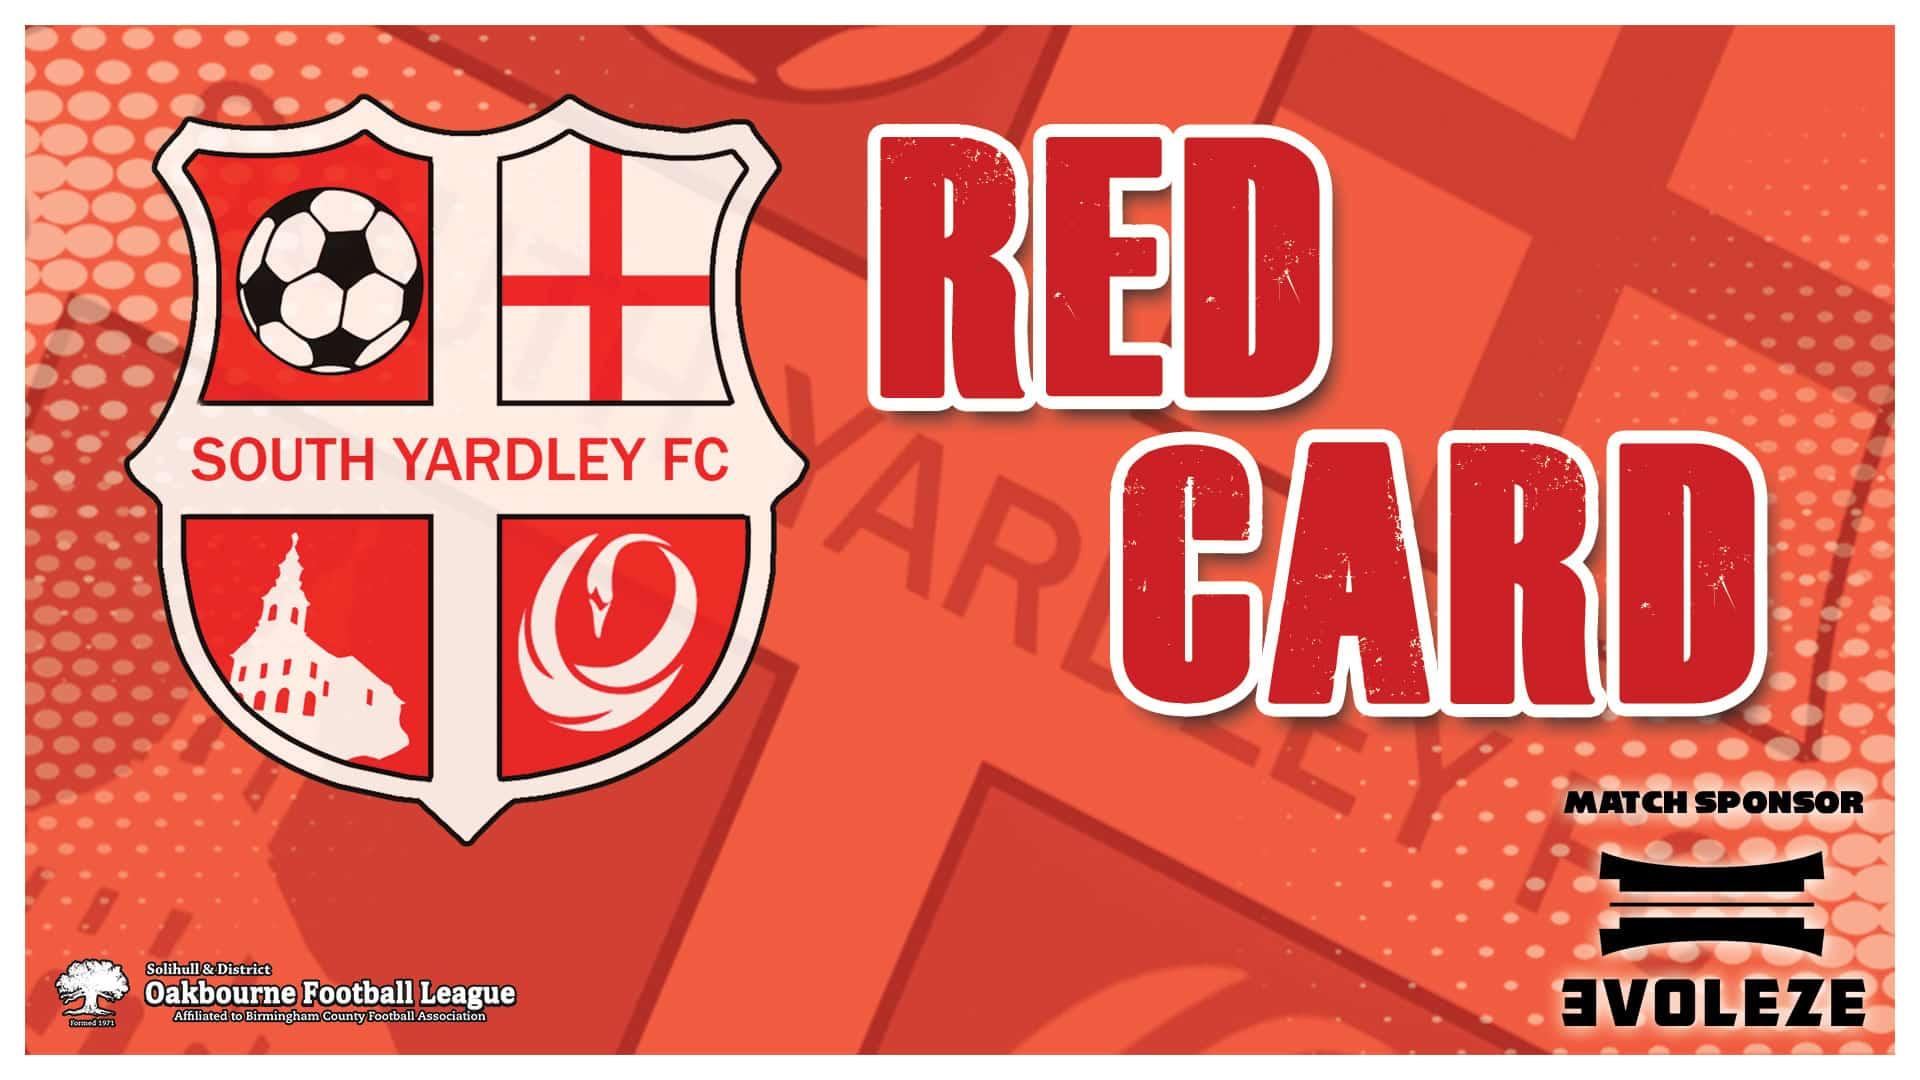 red card South Yardley FC